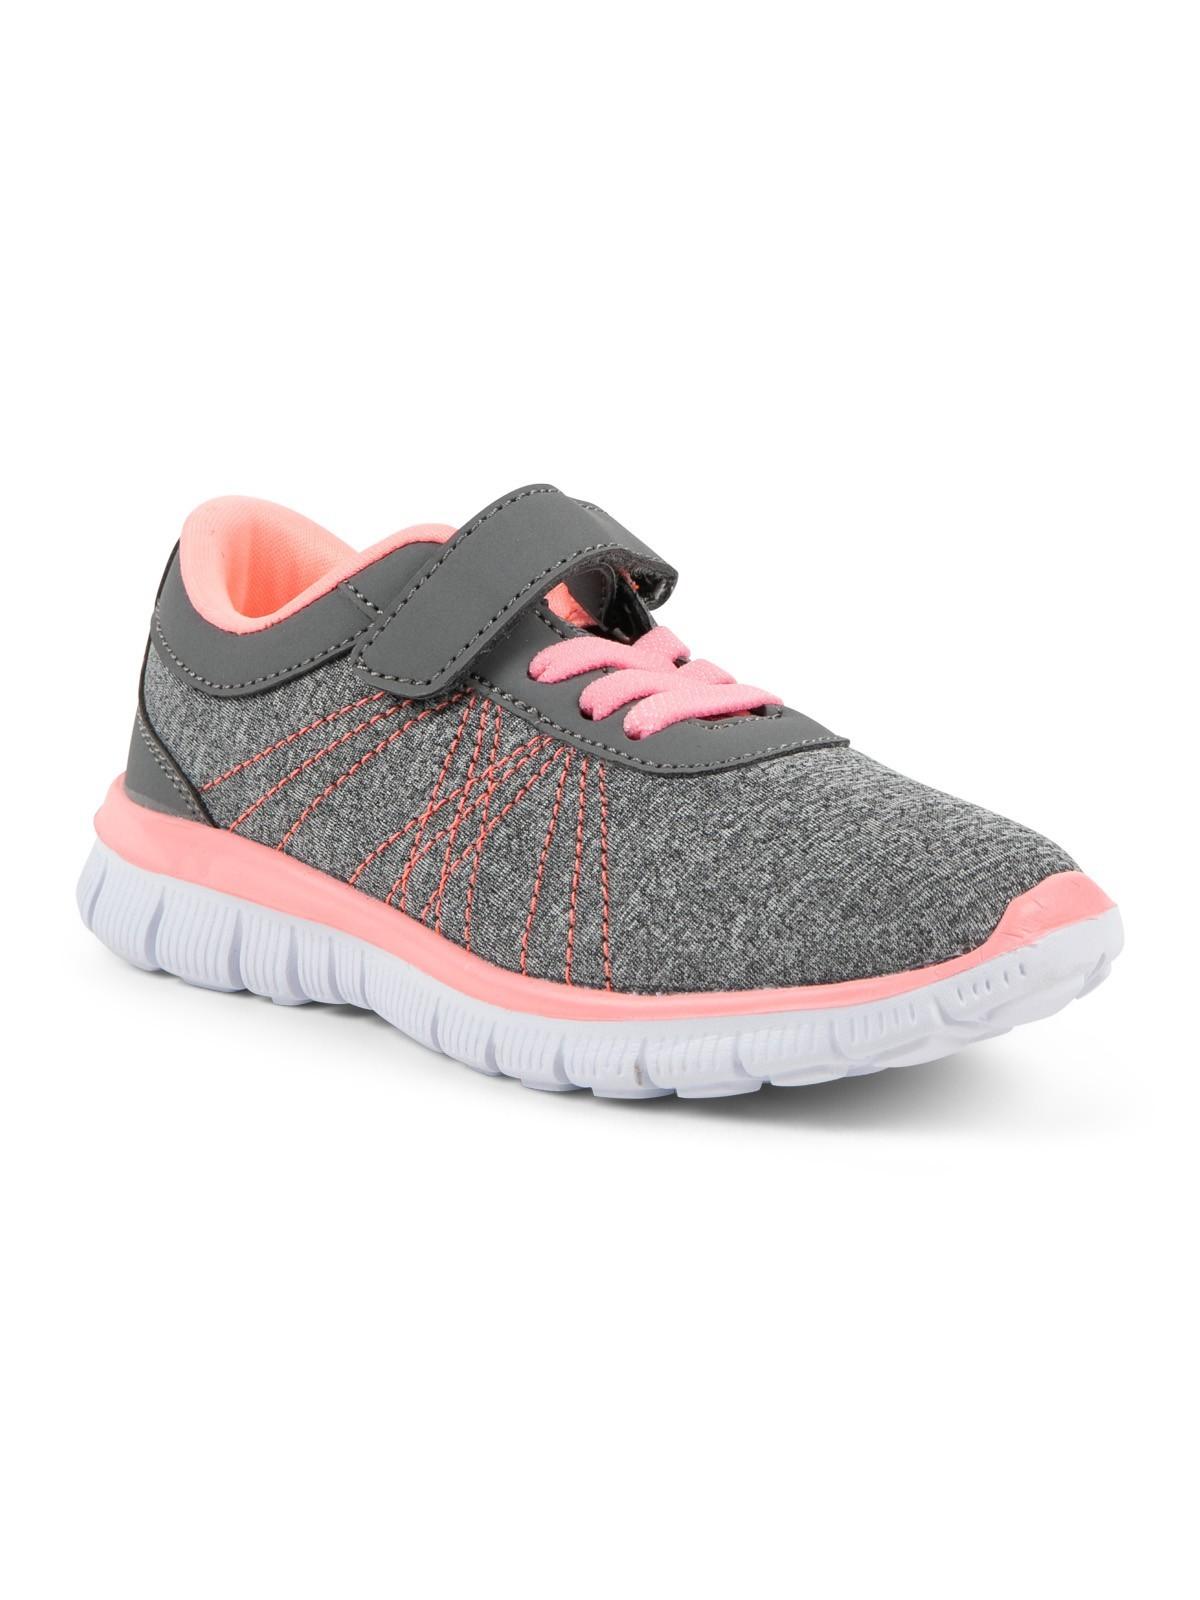 Chaussure sport fille gris (24 30) DistriCenter